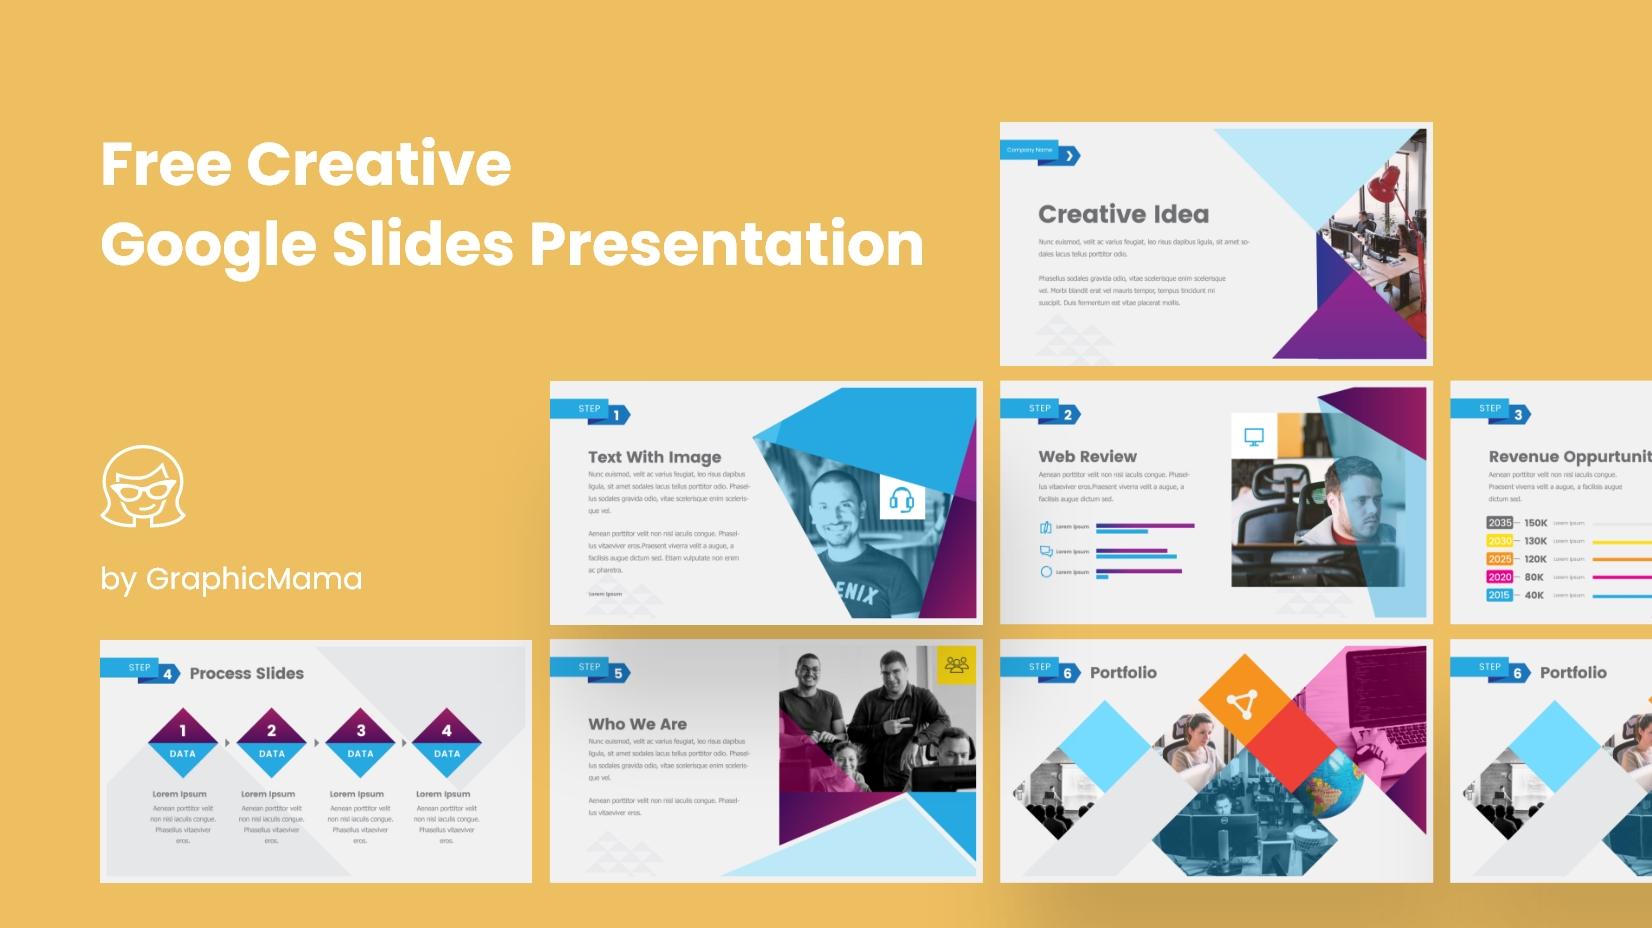 Free-Creative-Google-Slides-Presentation.